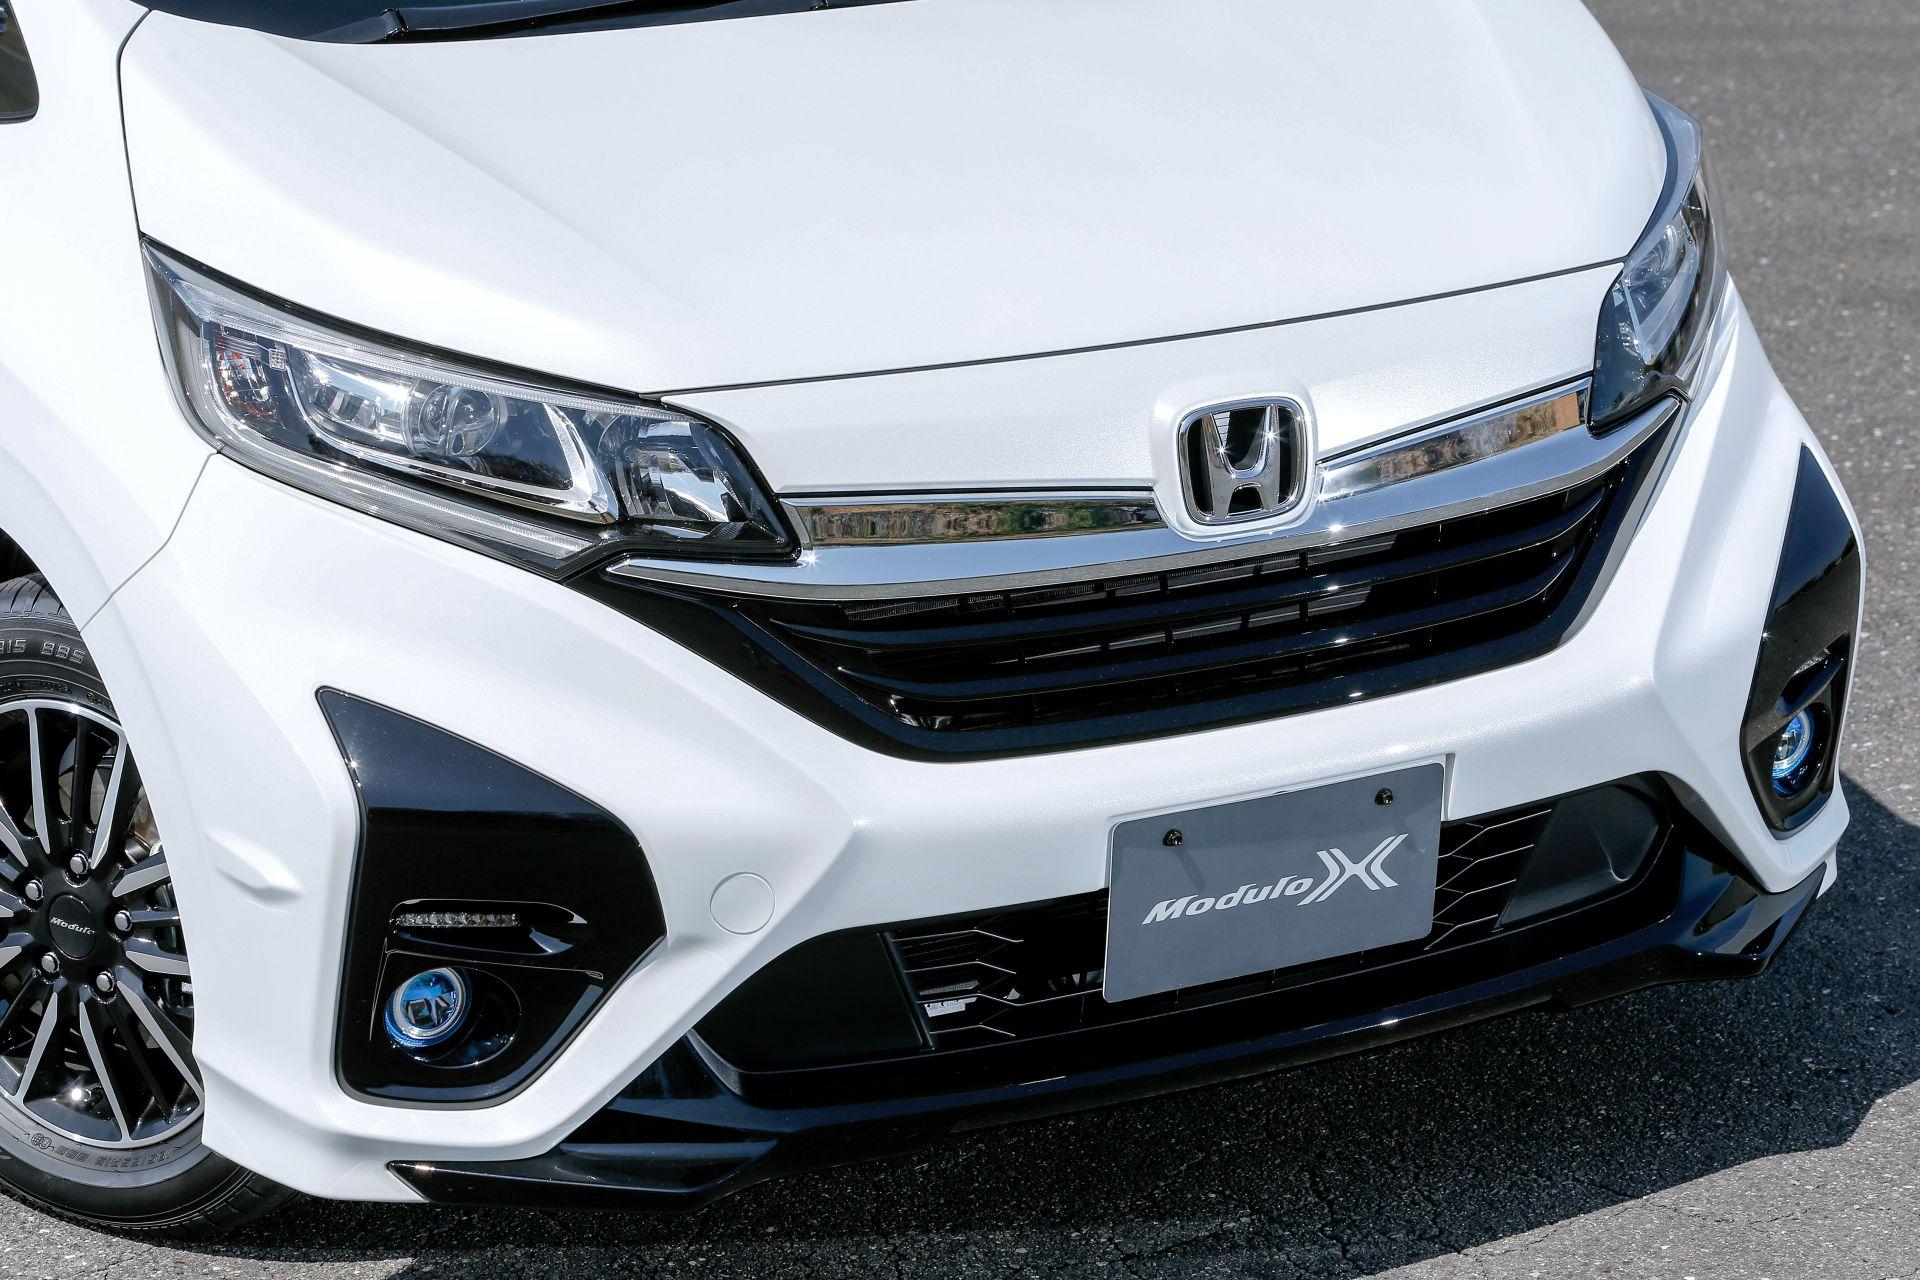 Honda-Freed-Modulo-X-Facelift-2020-22